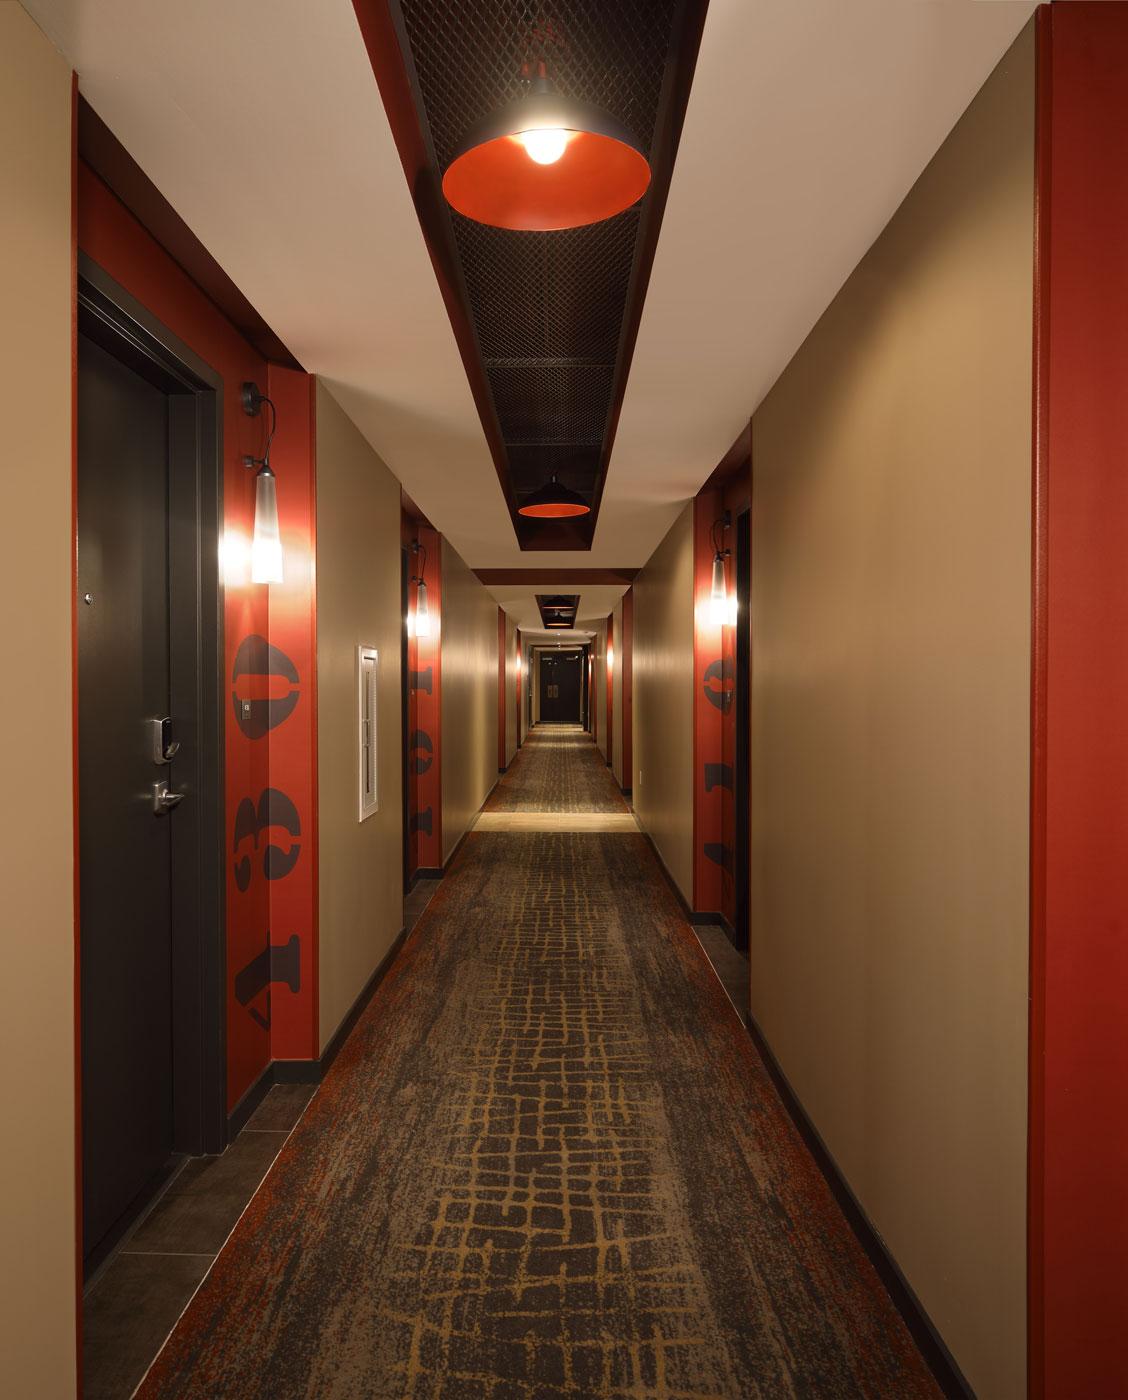 Unique corridors at The Belgard - luxury apartment in the NoMa neighborhood